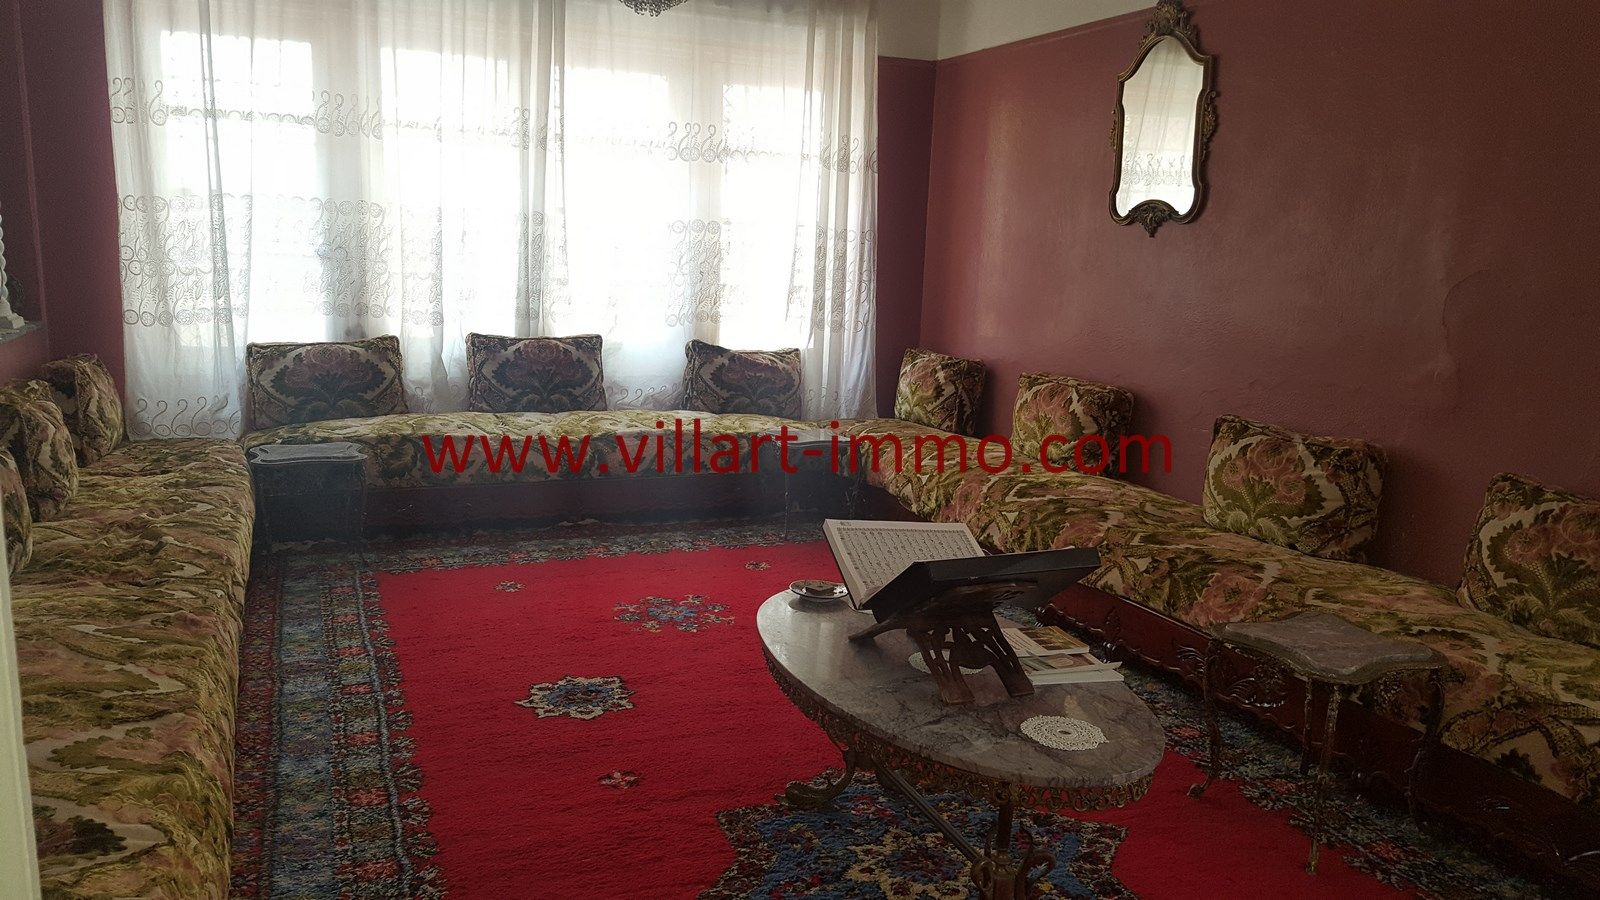 6-Vente-Maison-Tanger-Centre Ville-Salon-VM499-Villart Immo